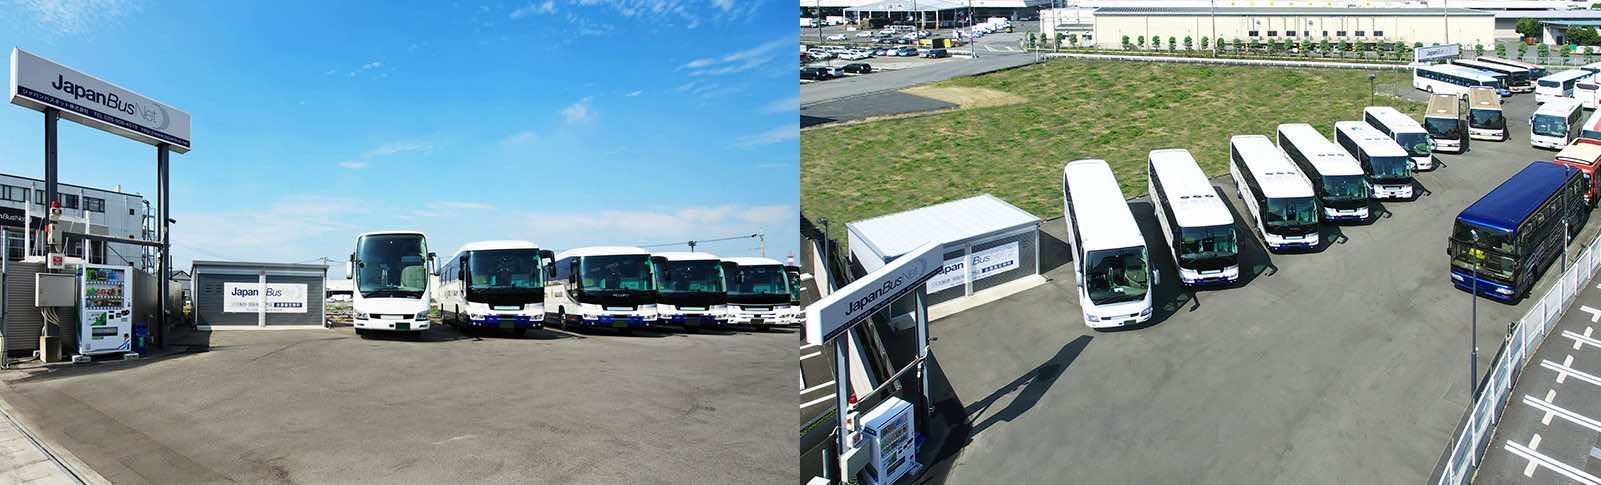 Japan Bus Net